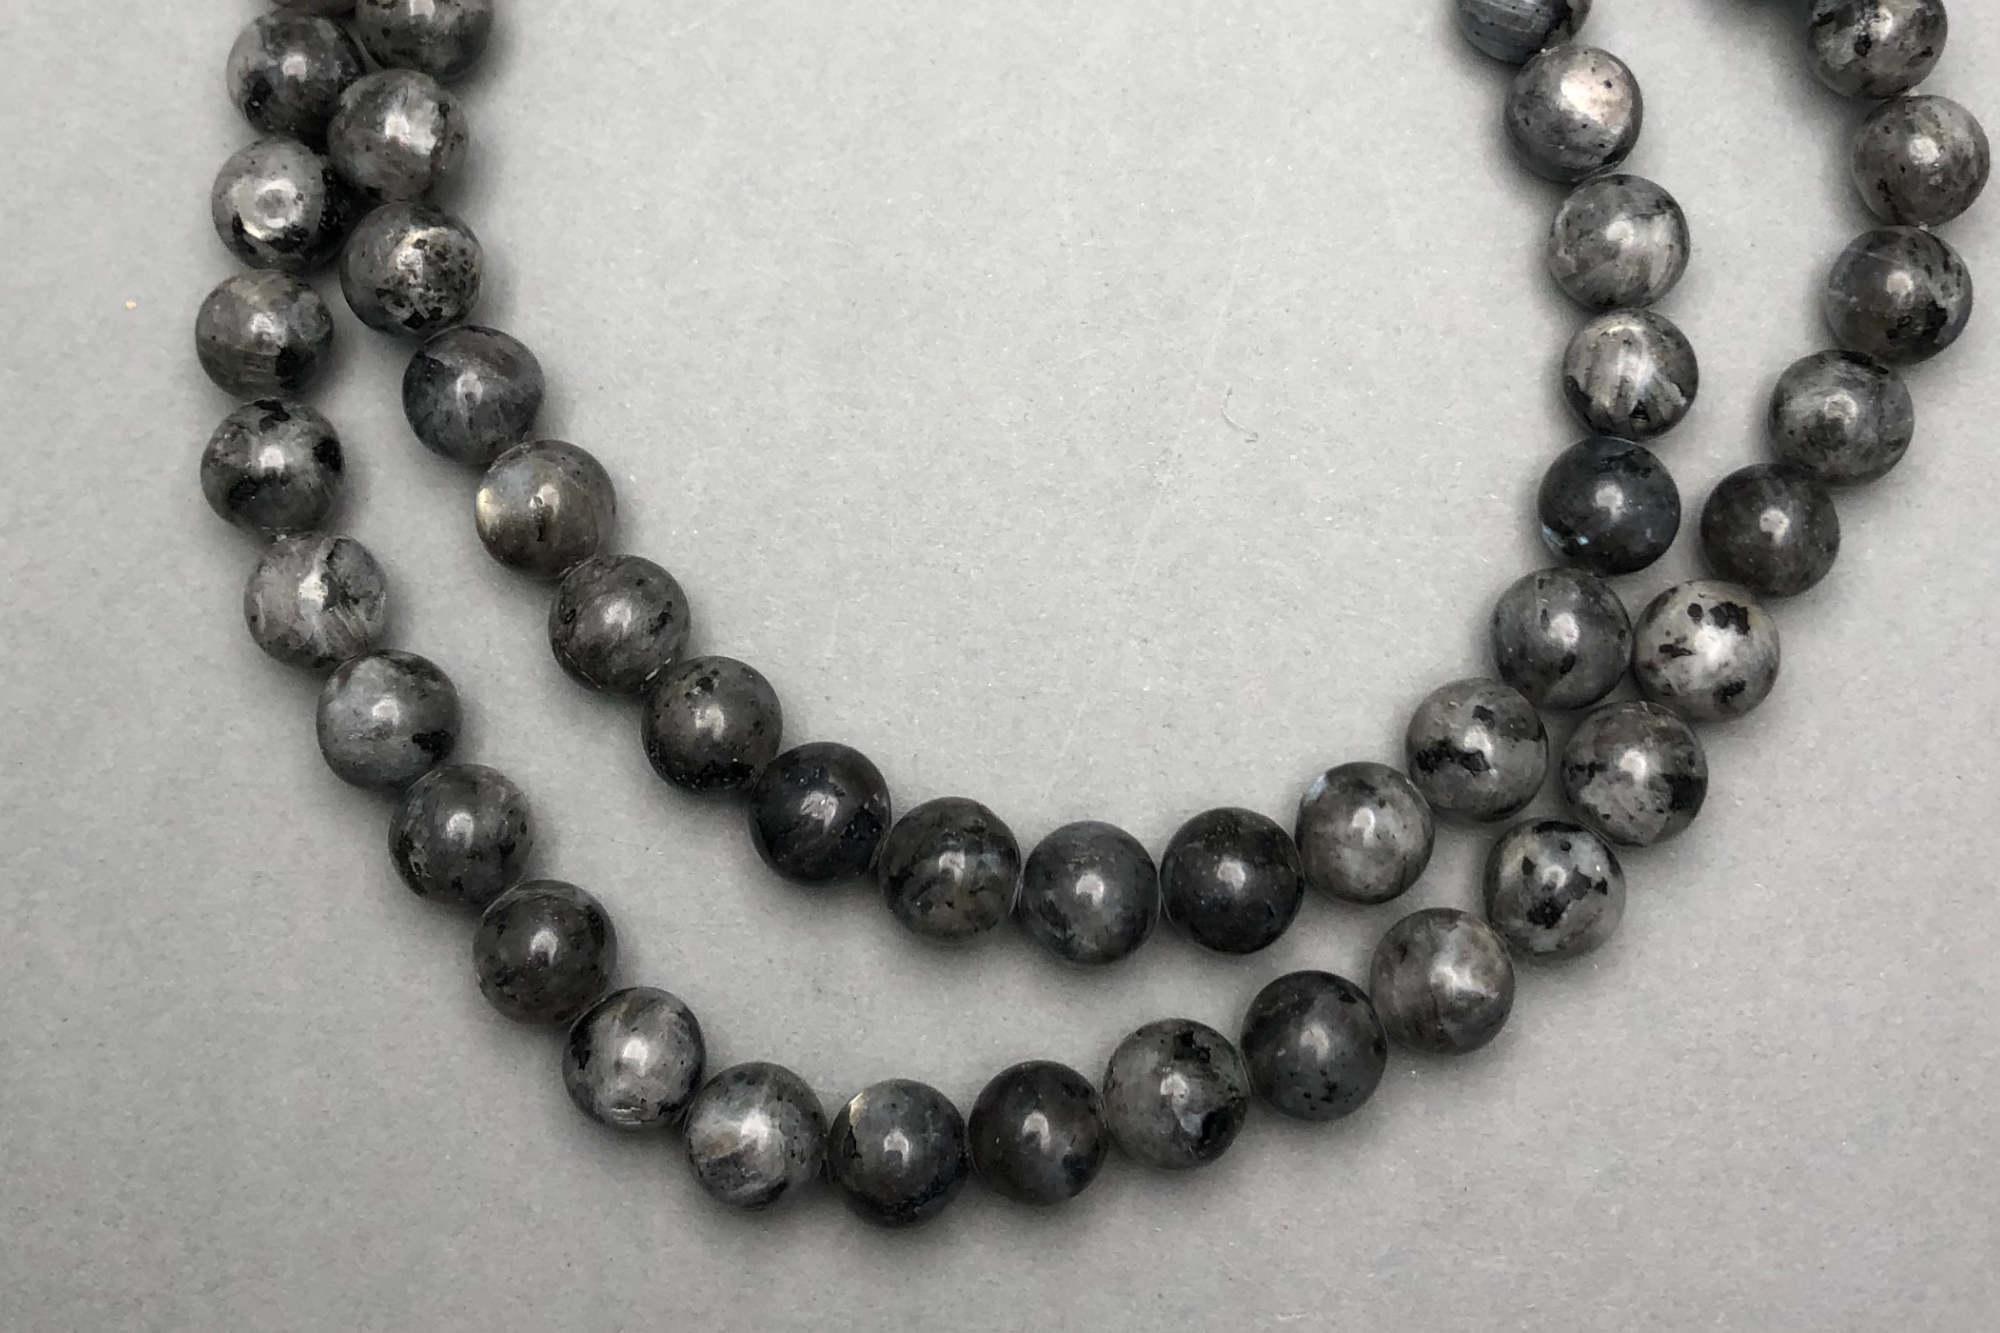 Grey Labradorite 38cm Strand, 8mm Round